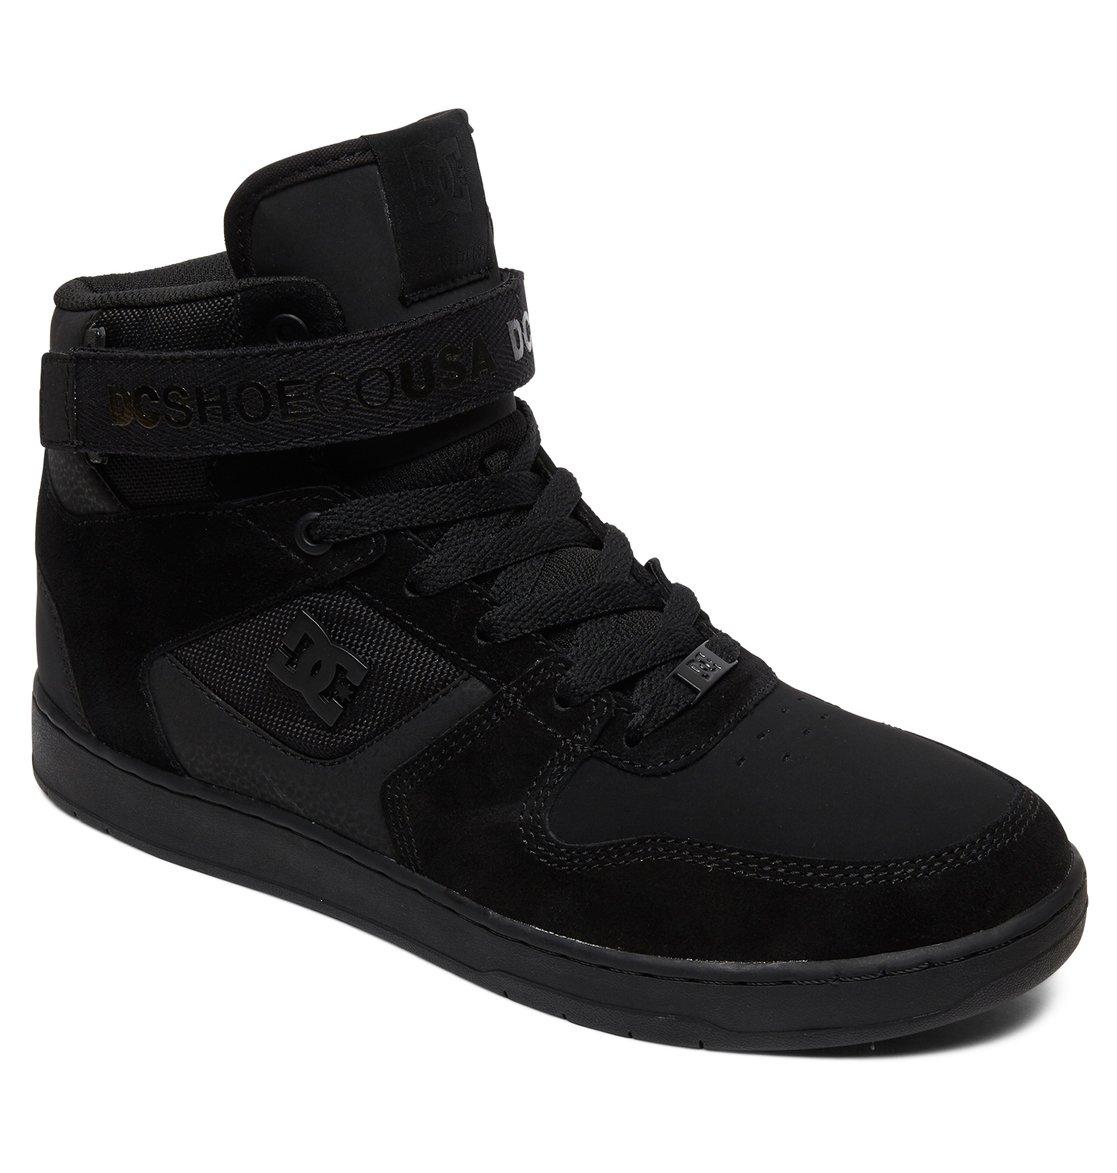 Uomo Pensford Scarpe Dc Shoes Da Adys400038 Alte BtTxTw1q7